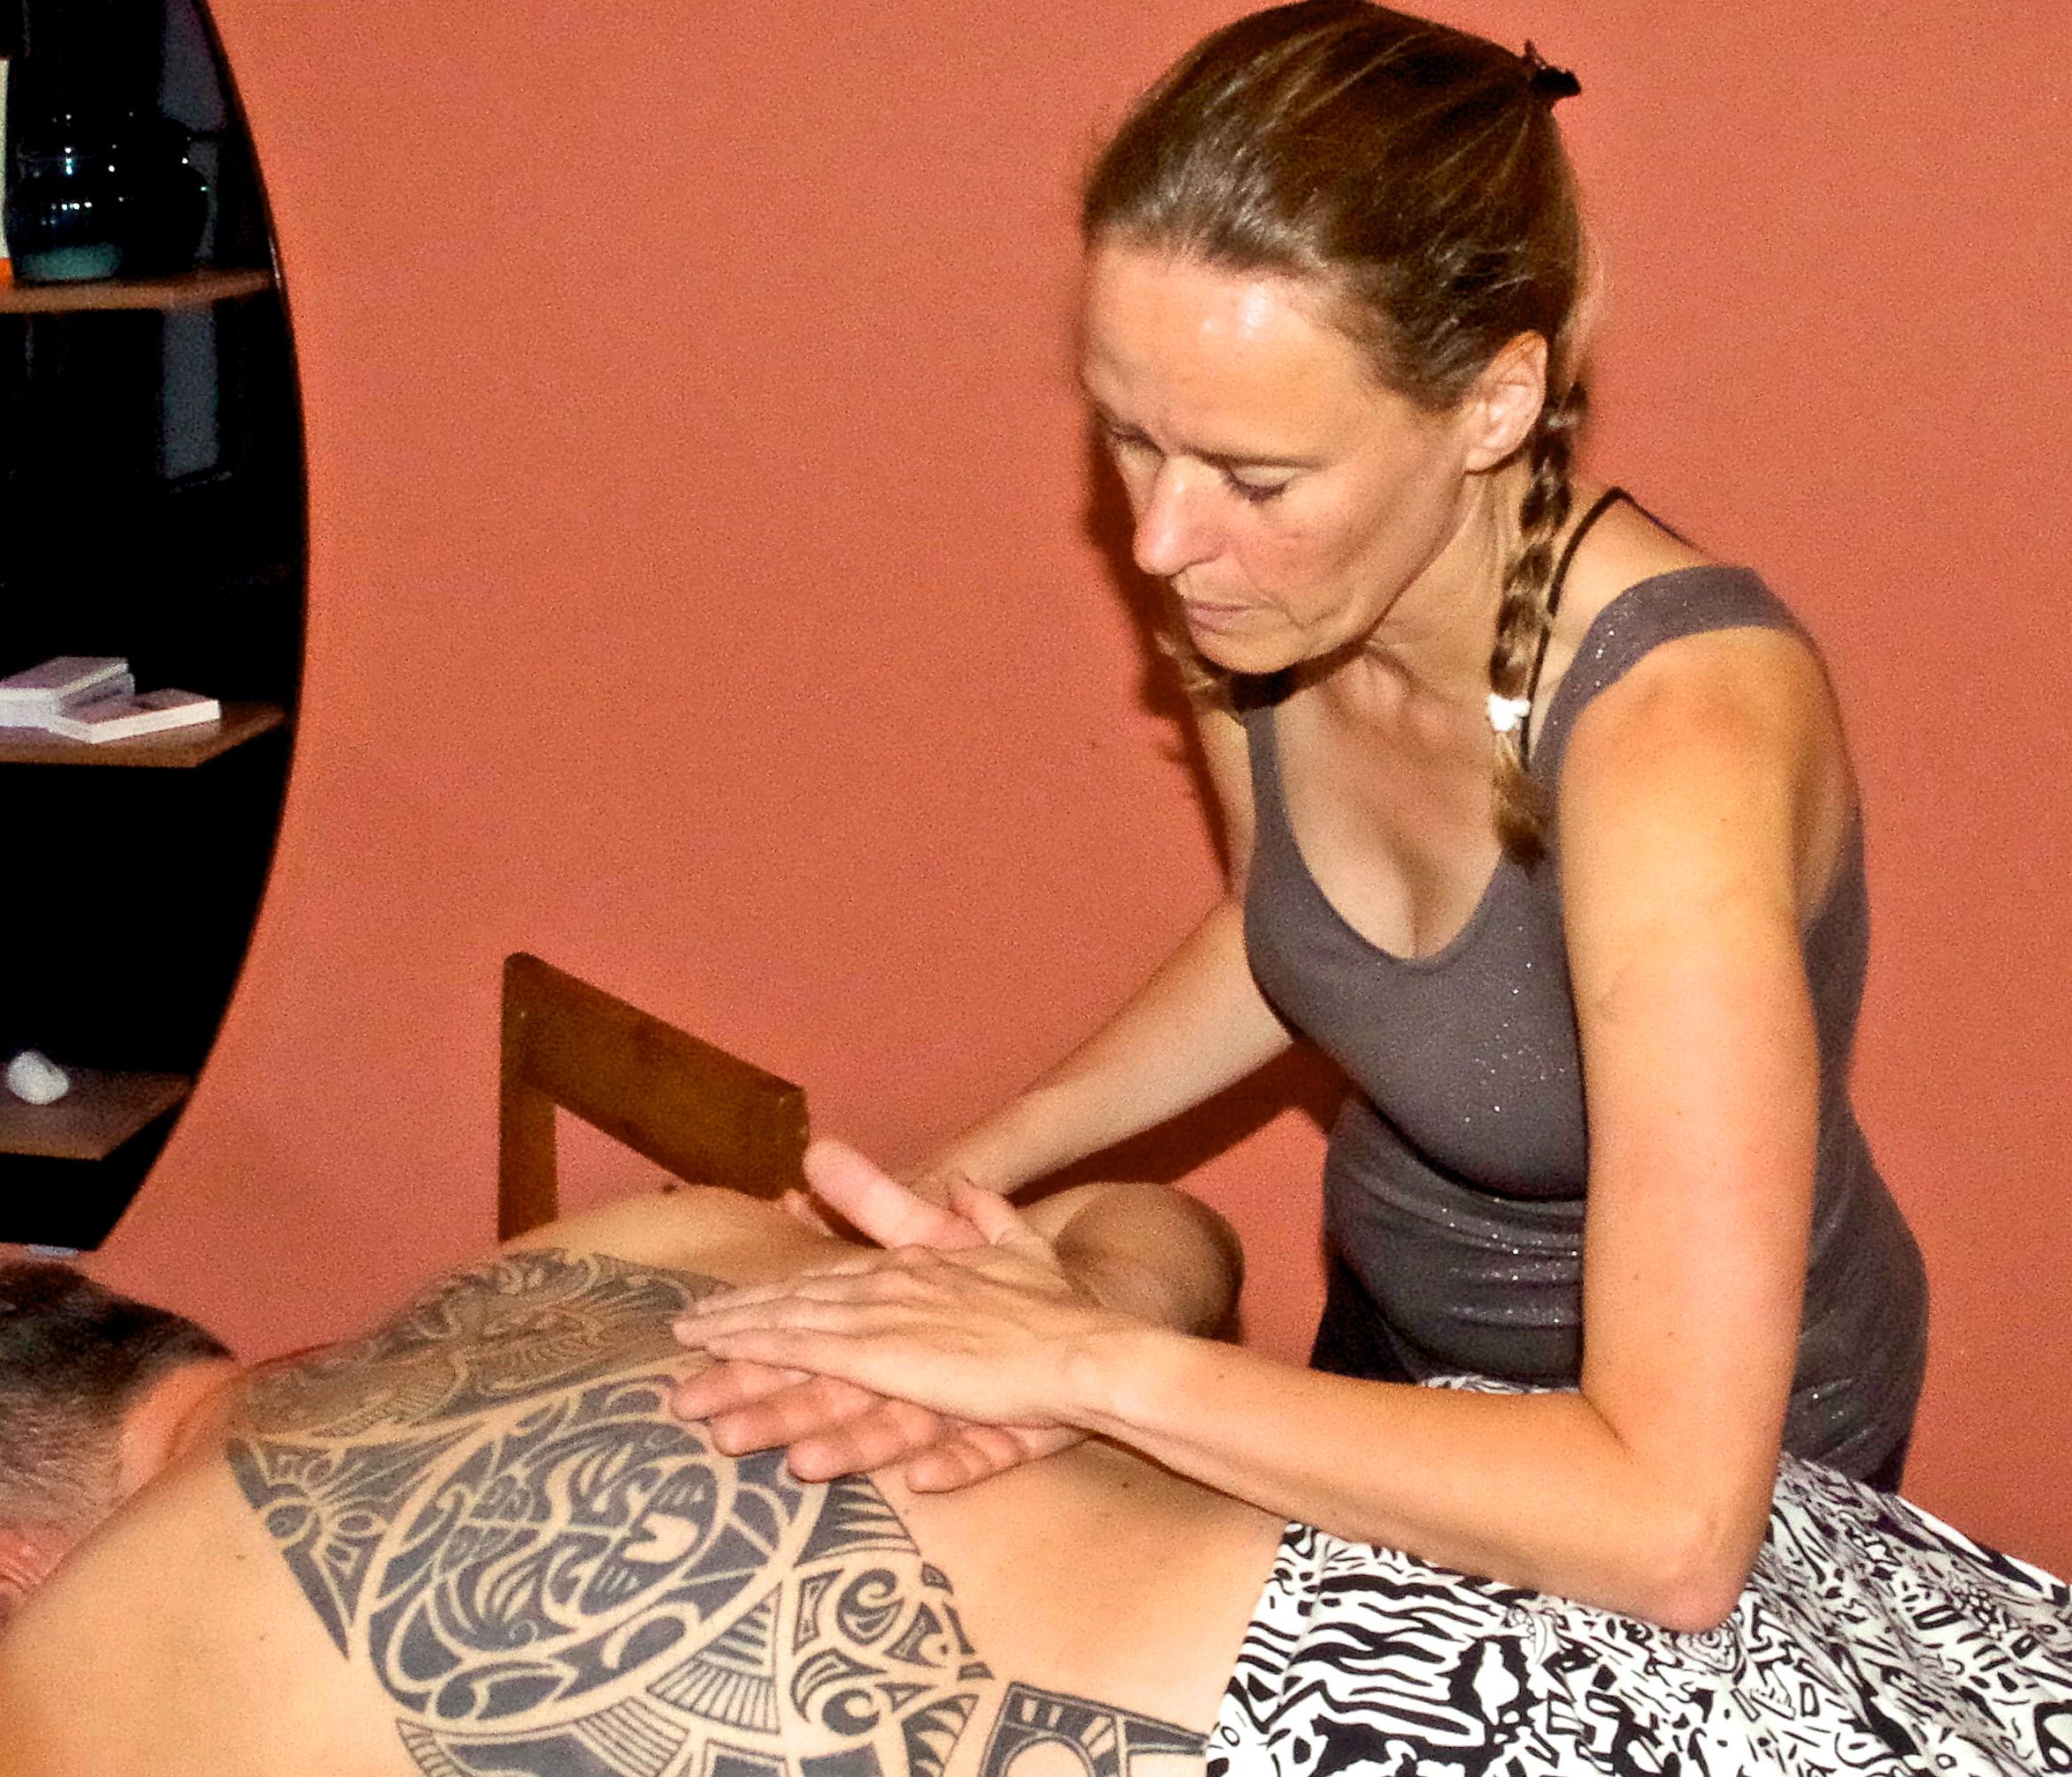 Erfahrung tantra massage